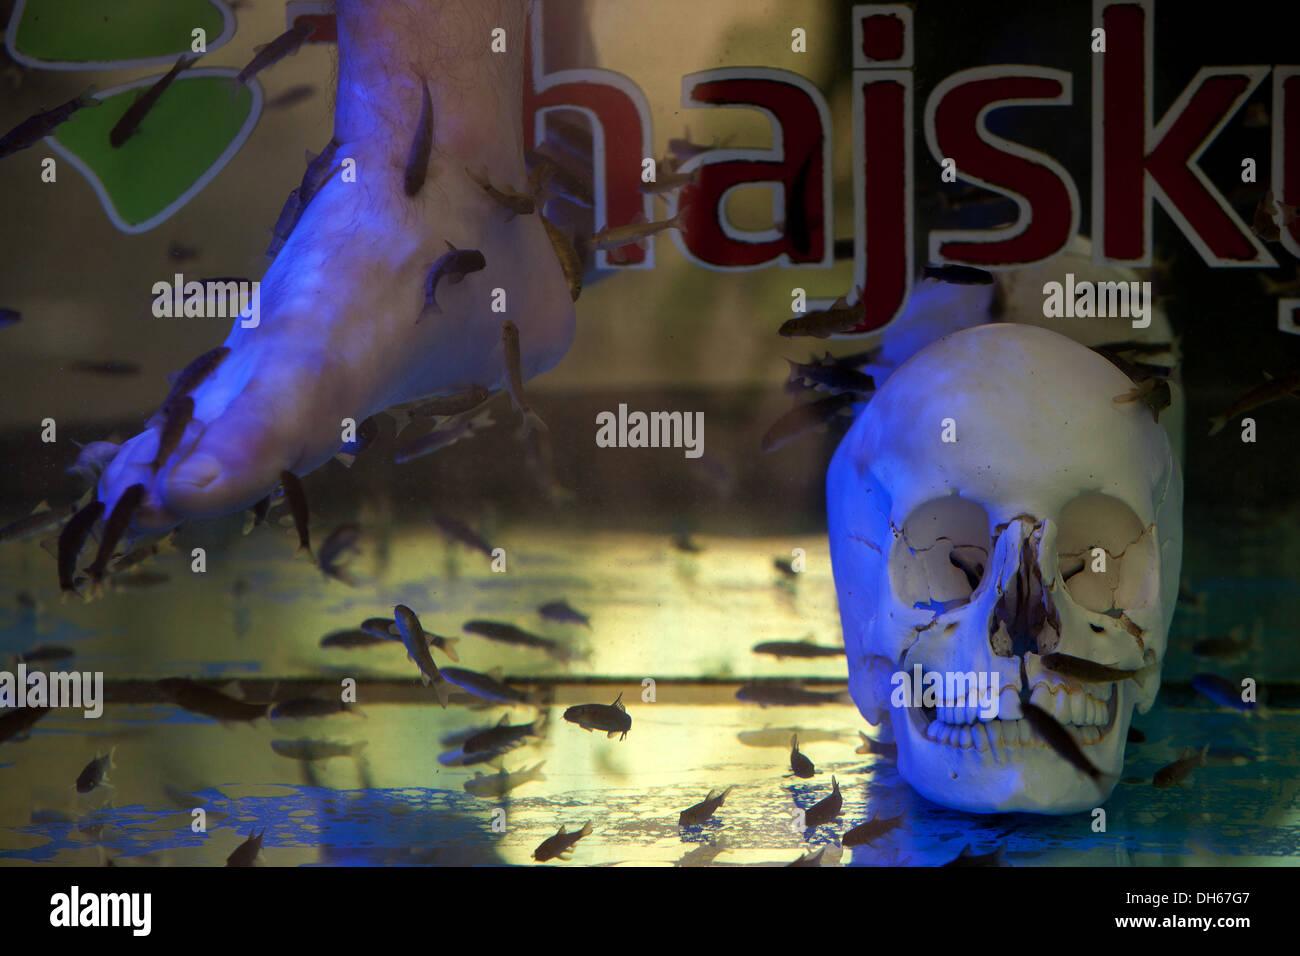 Fish spa pedicure in shop window street prague czech for Garra rufa fish pedicure locations